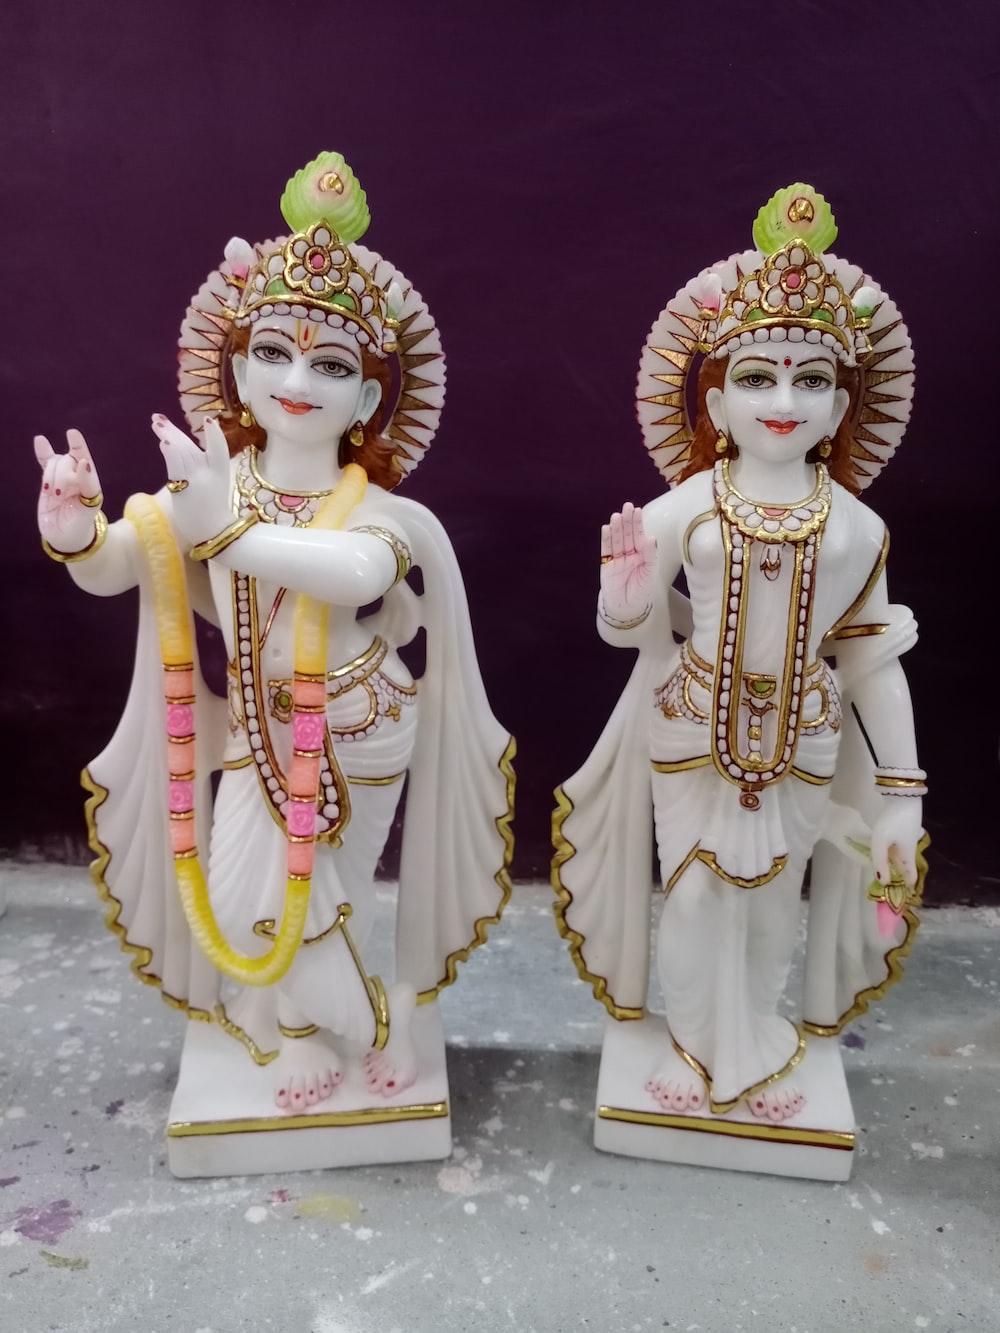 500 Krishna Pictures Hd Download Free Images On Unsplash